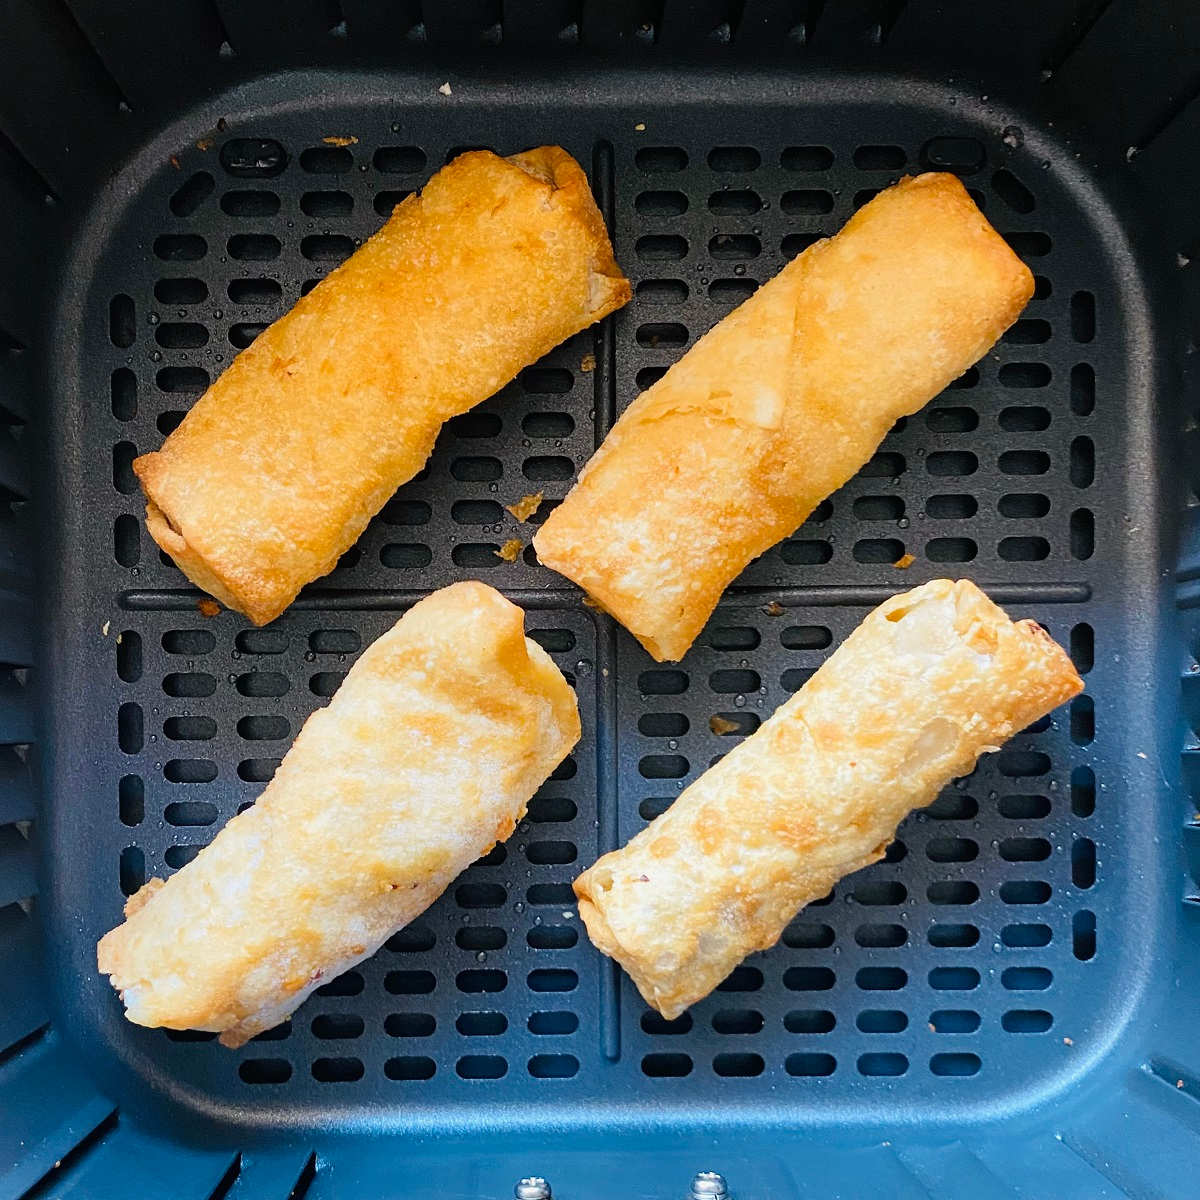 frozen egg rolls in air fryer basket